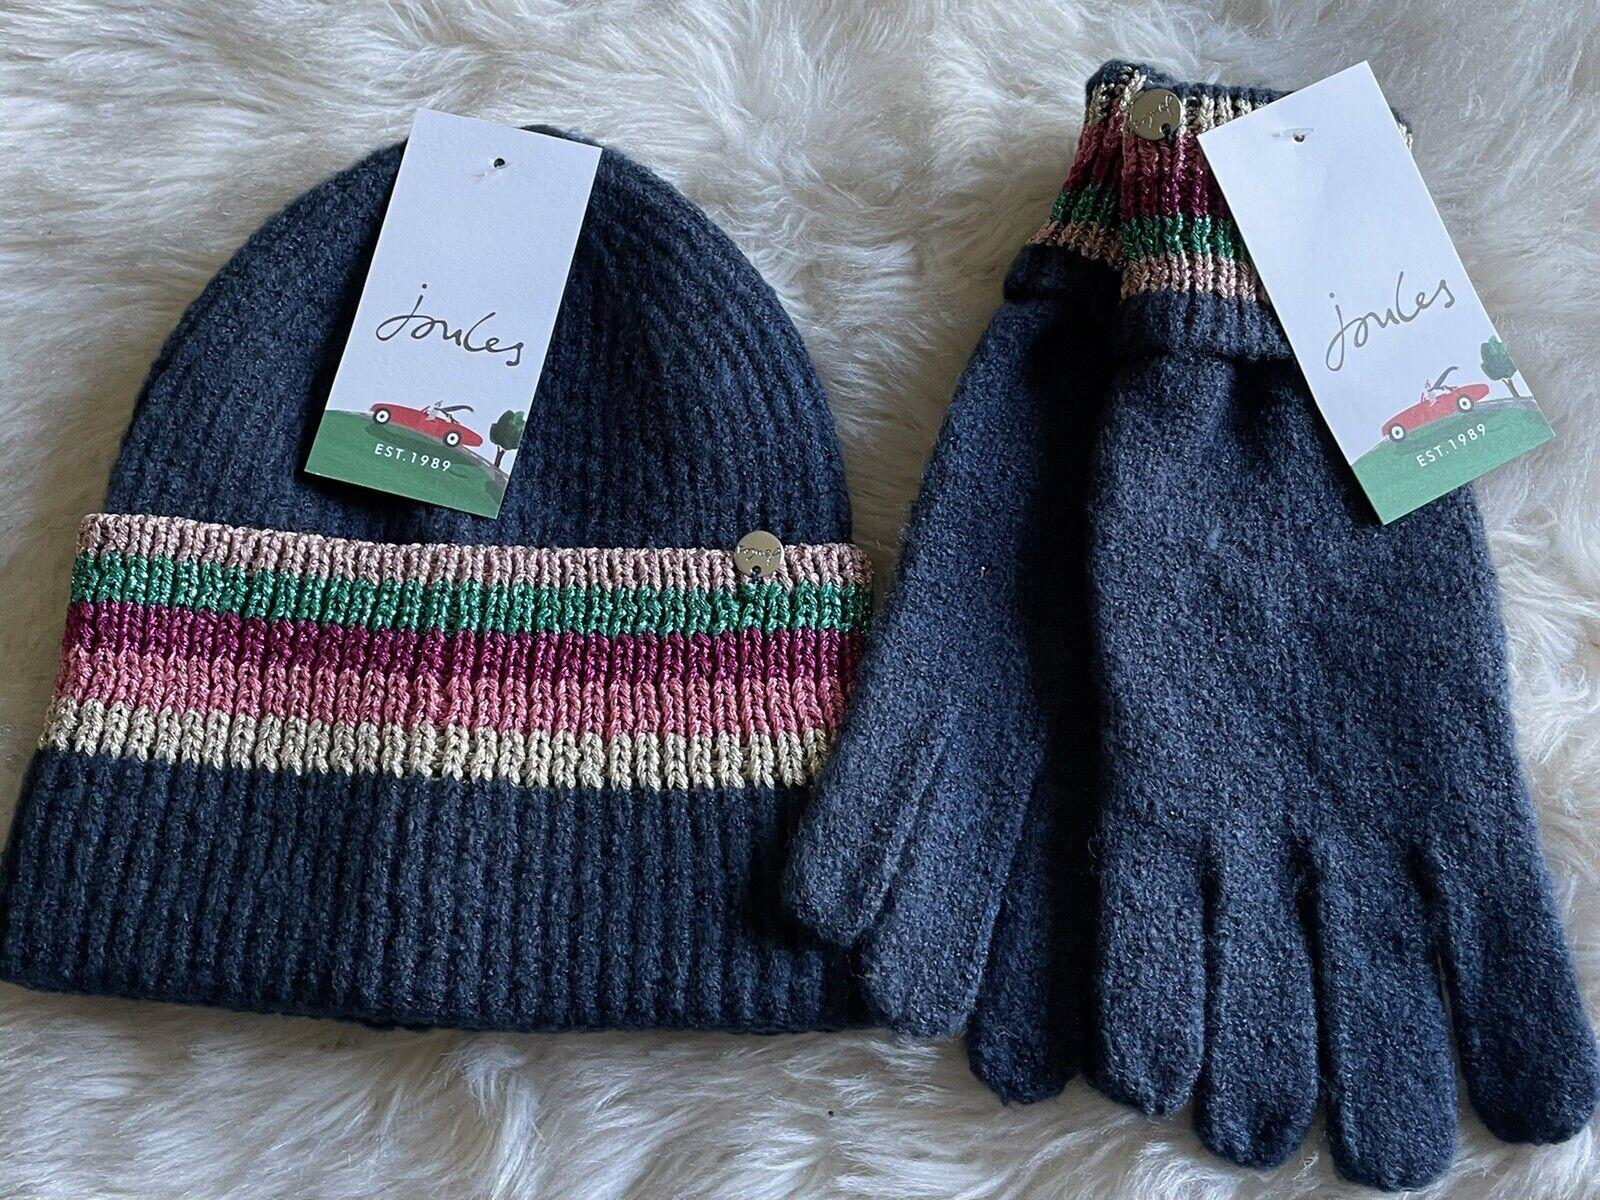 ⭐️ BNWT Joules Hat / Glove Set - Vinnie - Navy - Lovely Gift ⭐️